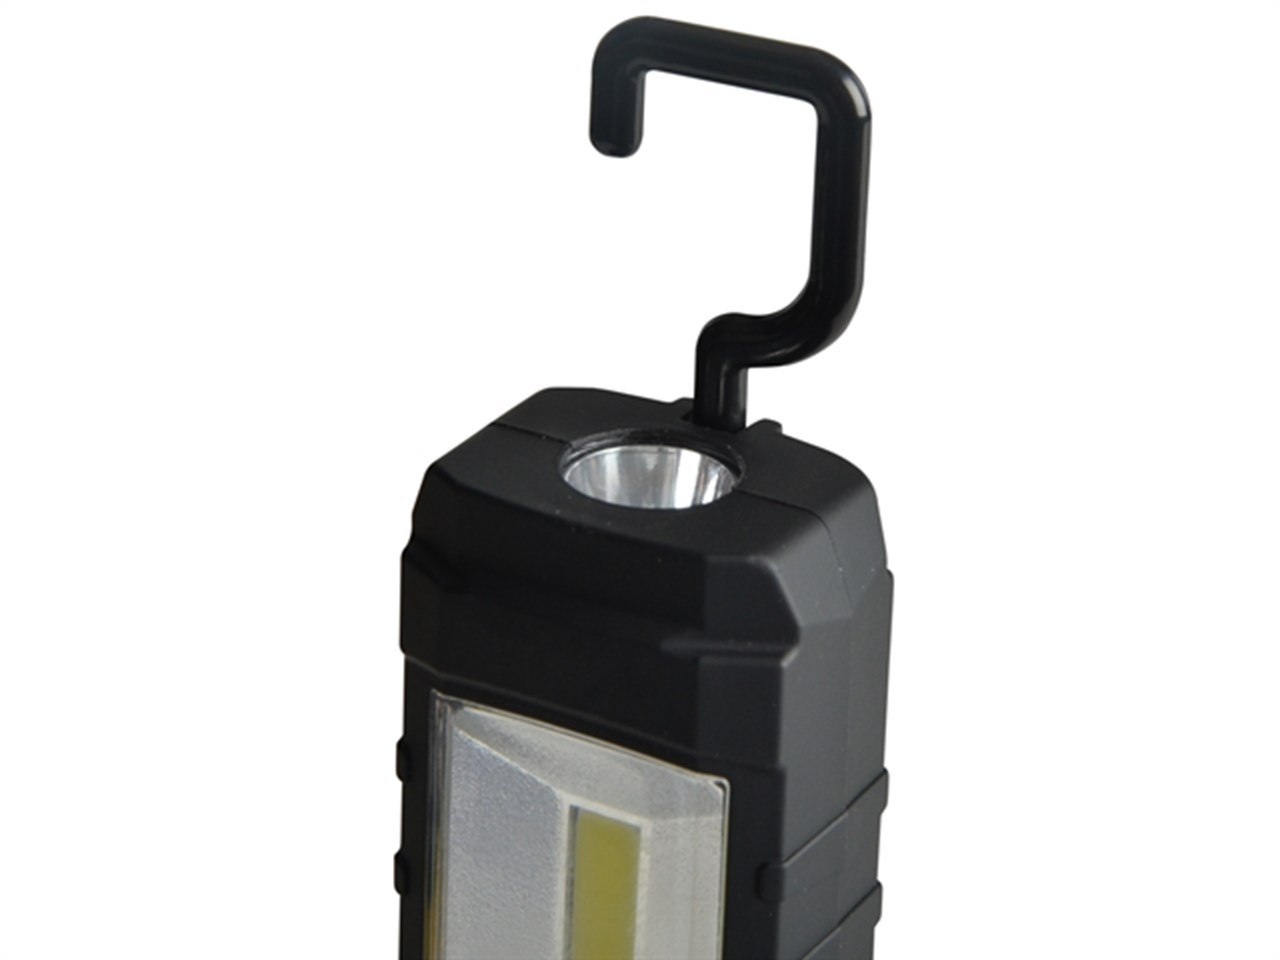 Lighthouse Xms18cob120 Swivel Stand Cob Led Light Rotating 038 Flashing 230v Lights Authorised Reseller